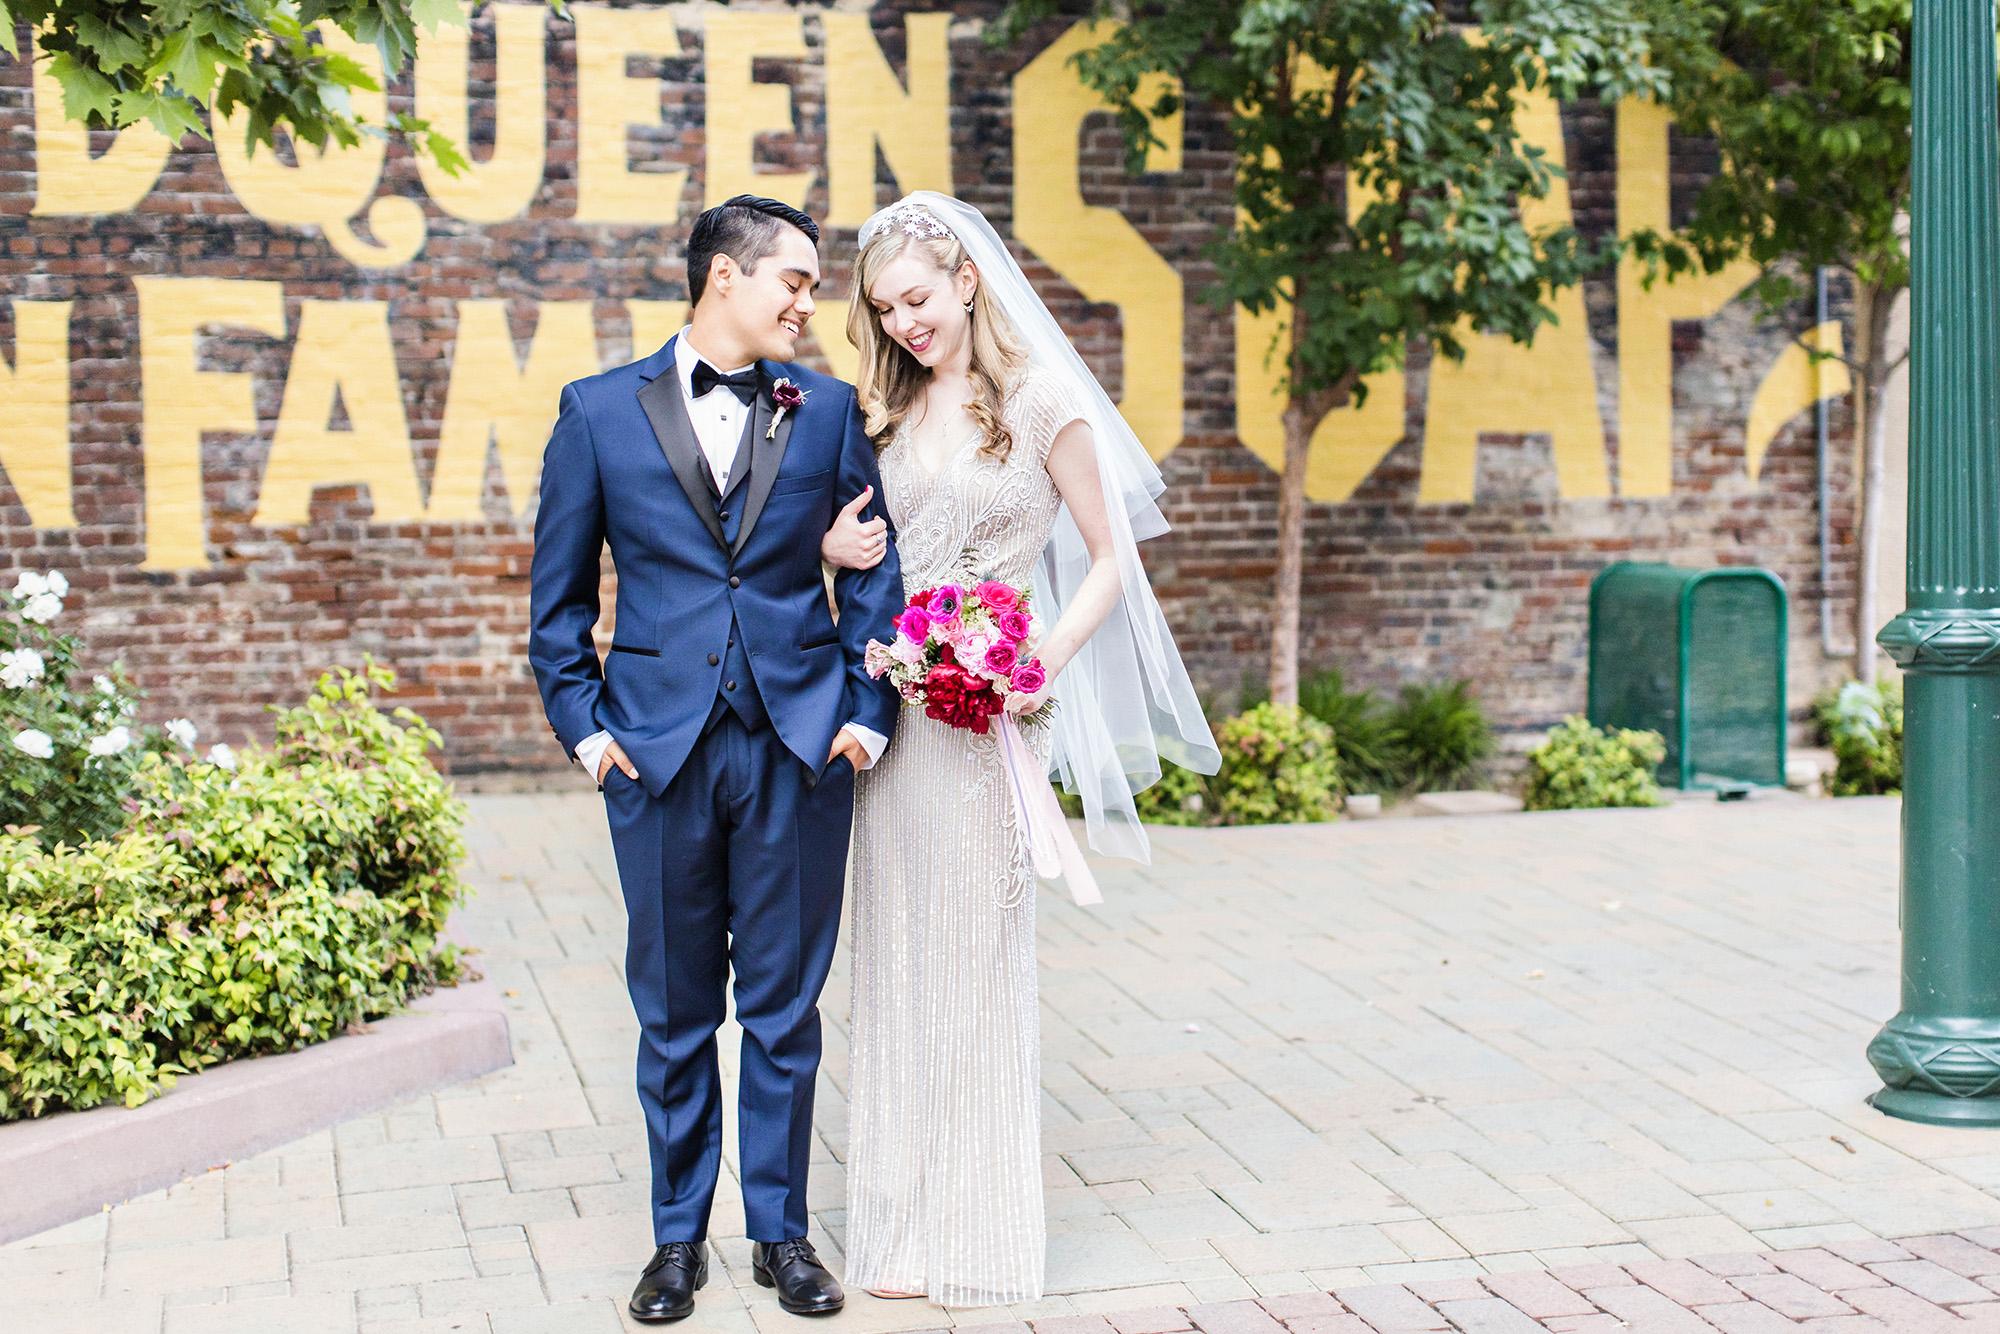 Bride and Groom wedding portraits in downtown Redlands - Speakeasy on State Street wedding